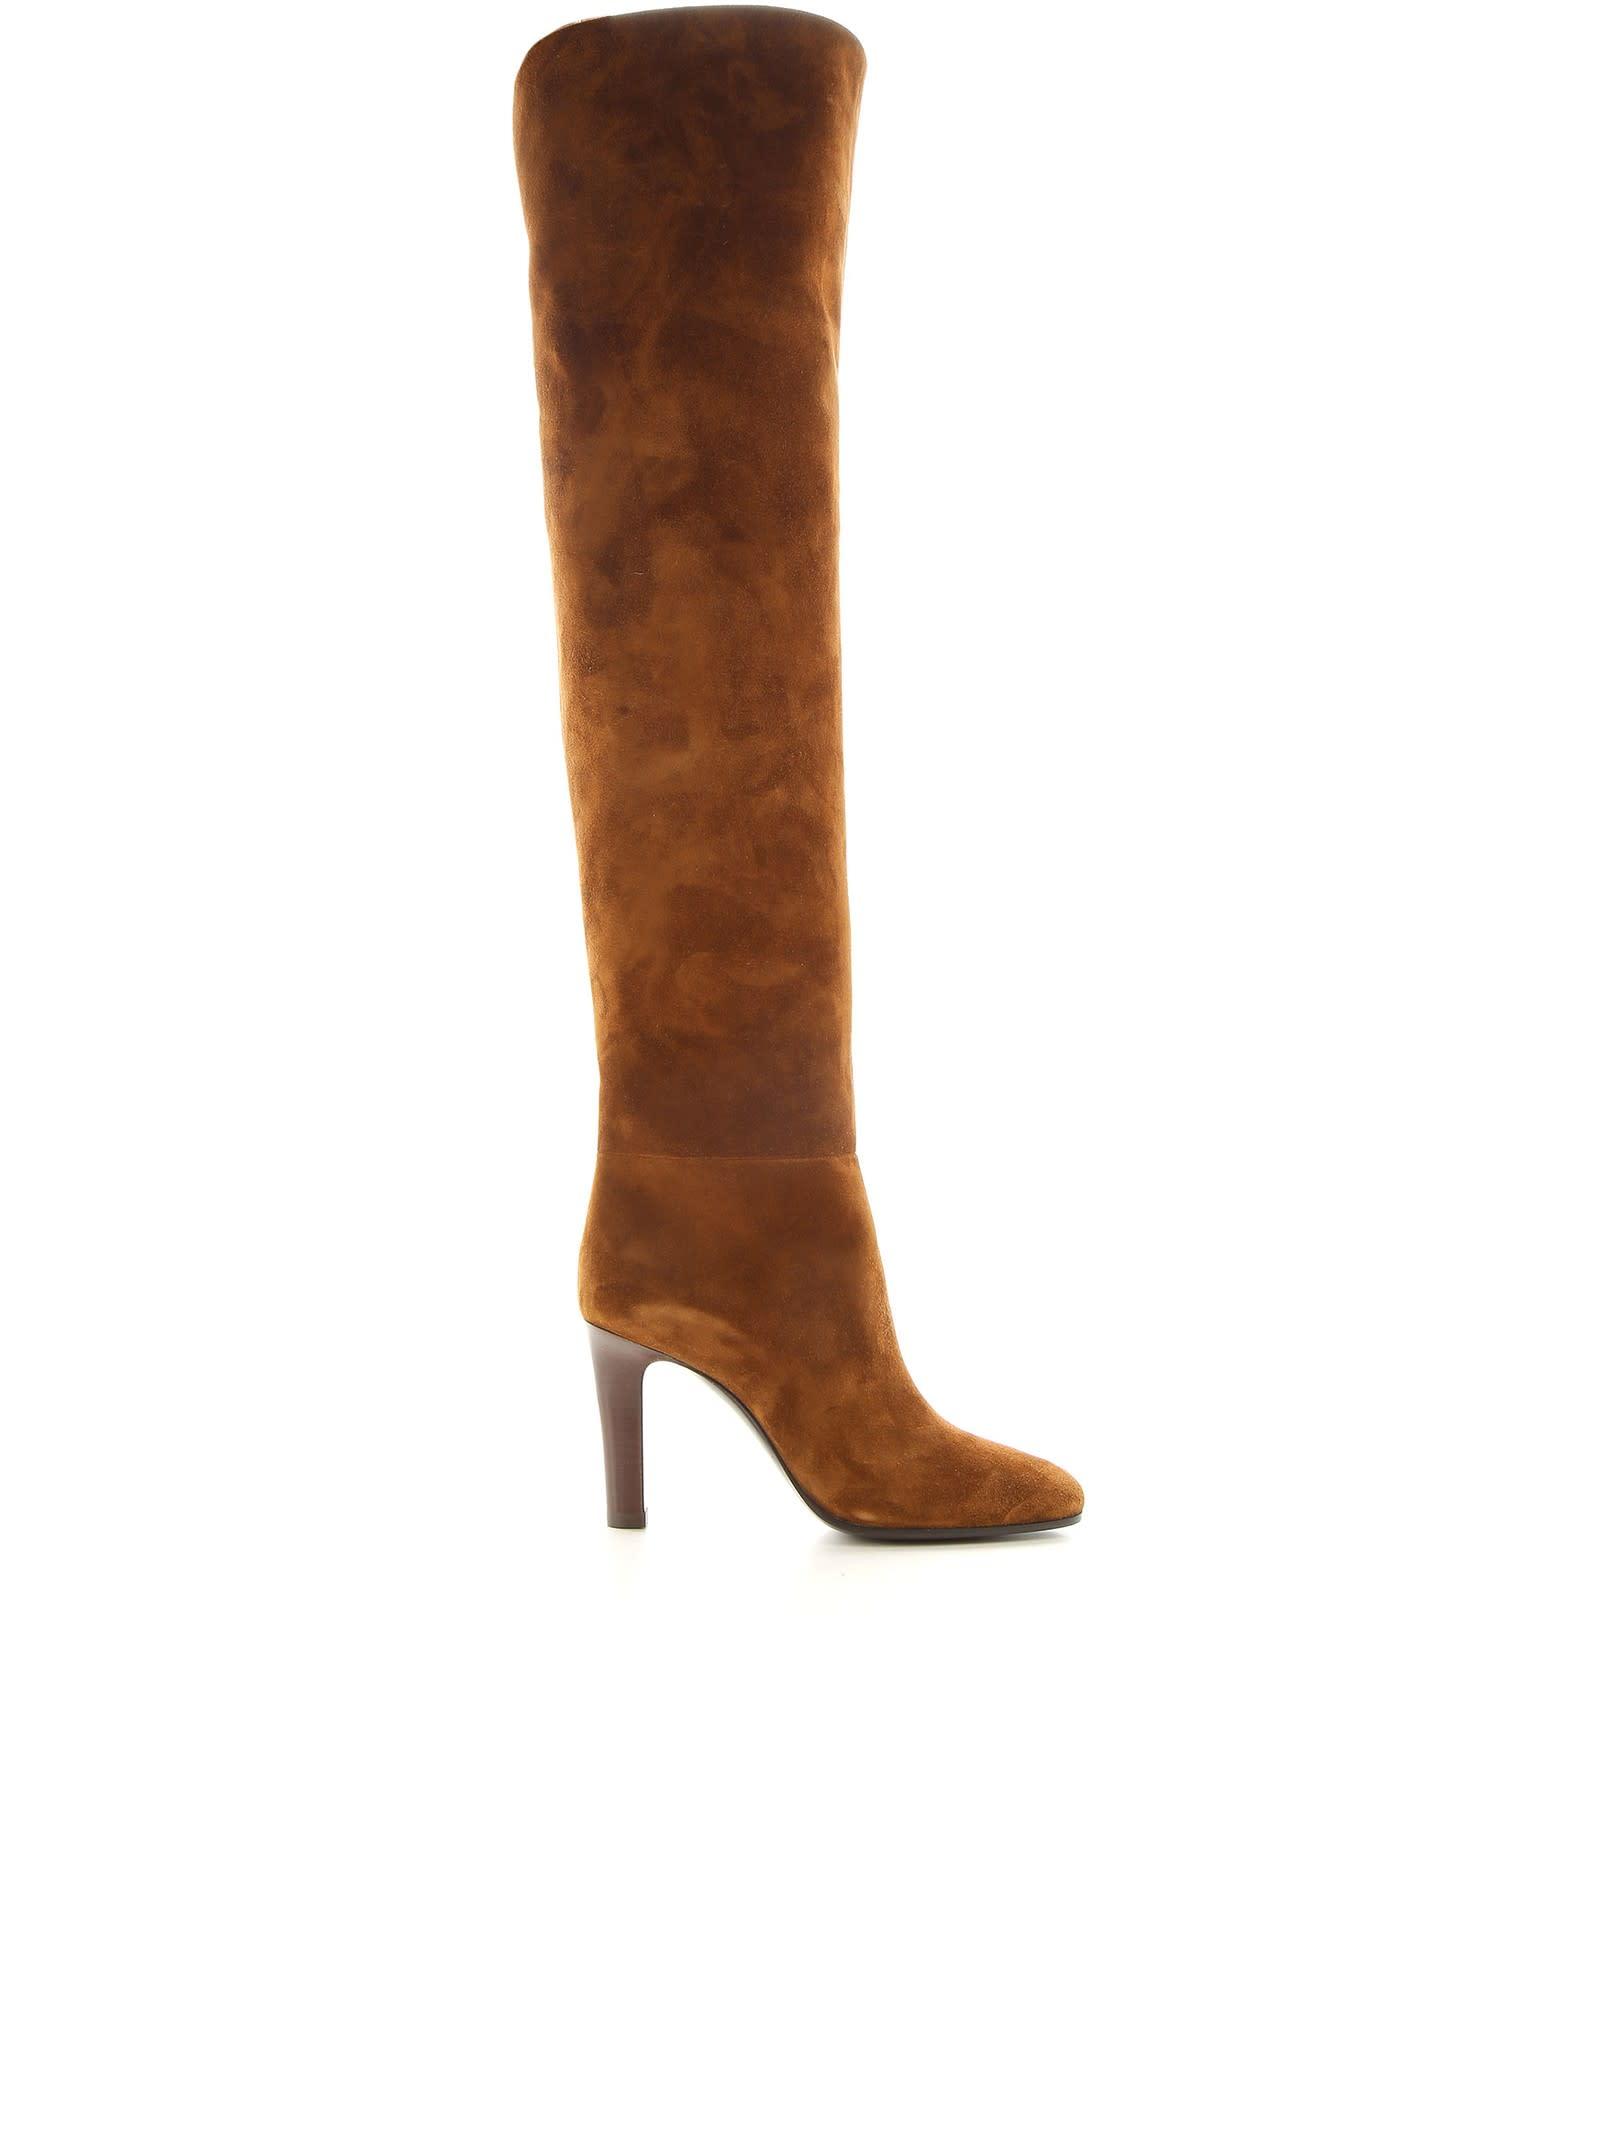 Buy Saint Laurent Brown Suede Blu 90 Boots online, shop Saint Laurent shoes with free shipping